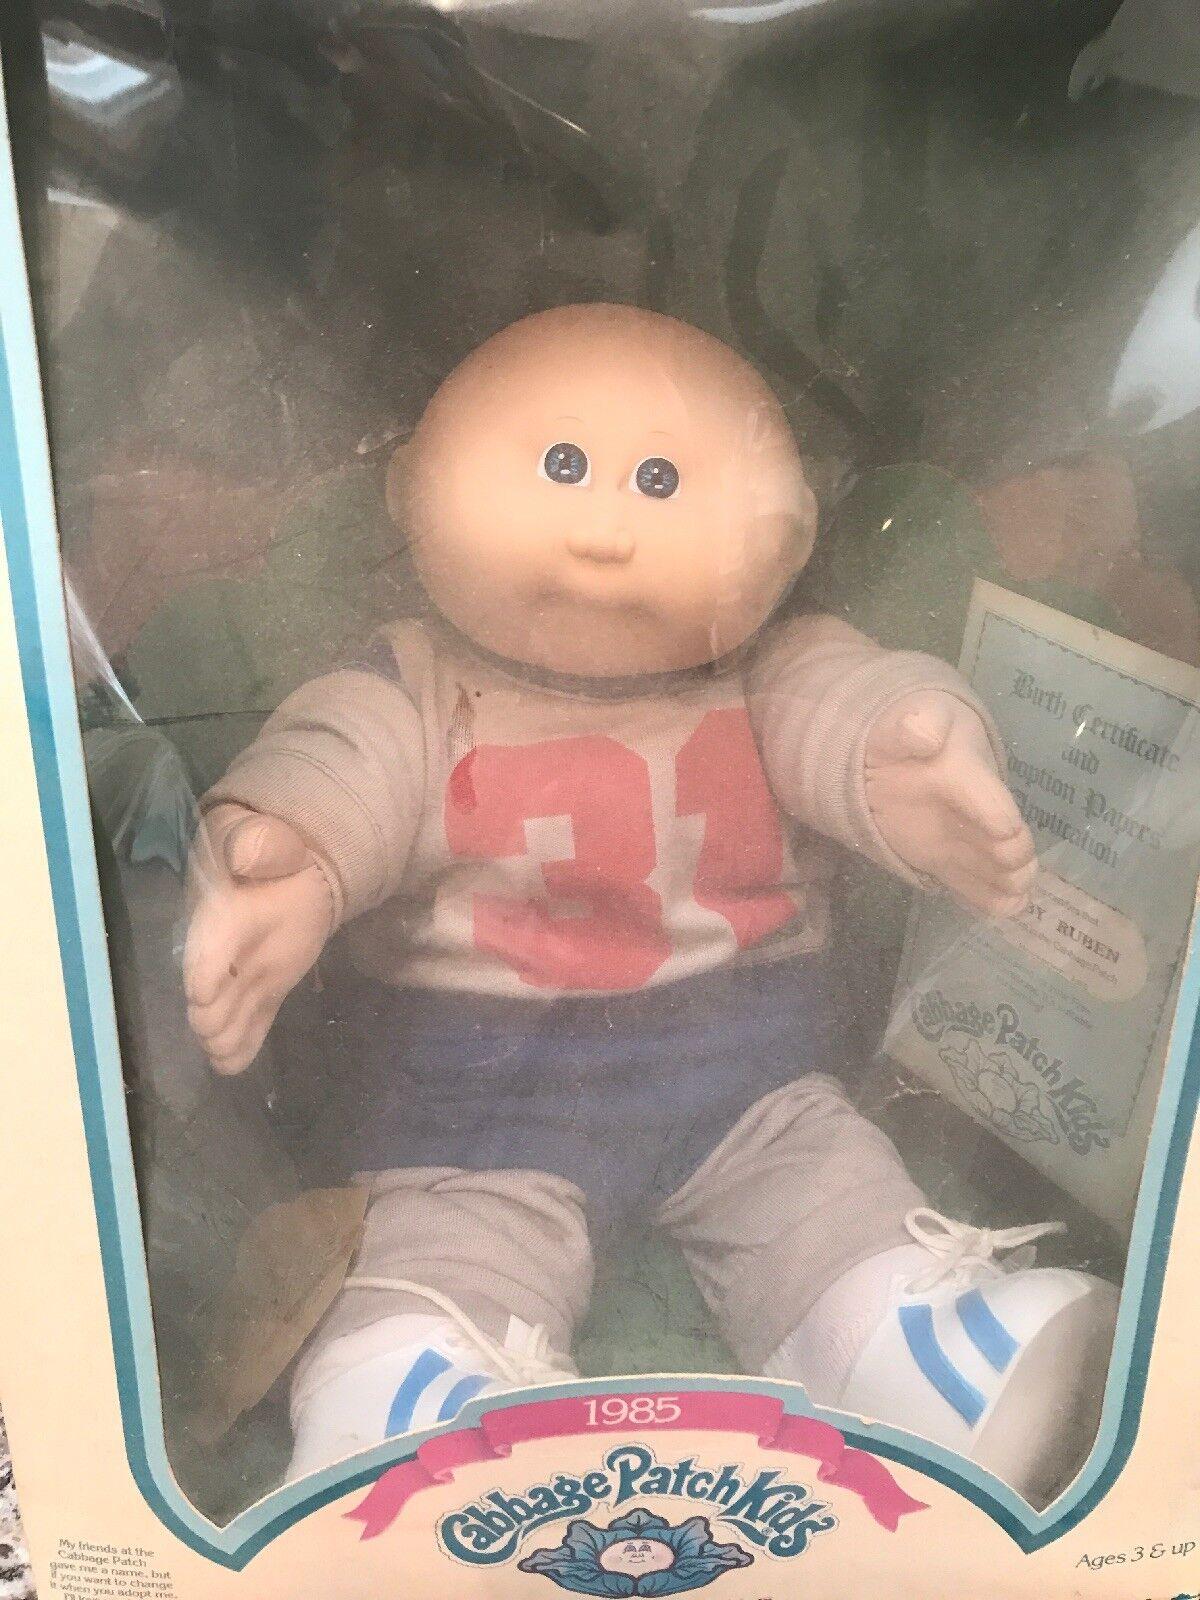 1985 Vintage Cabbage Patch Doll Baldie